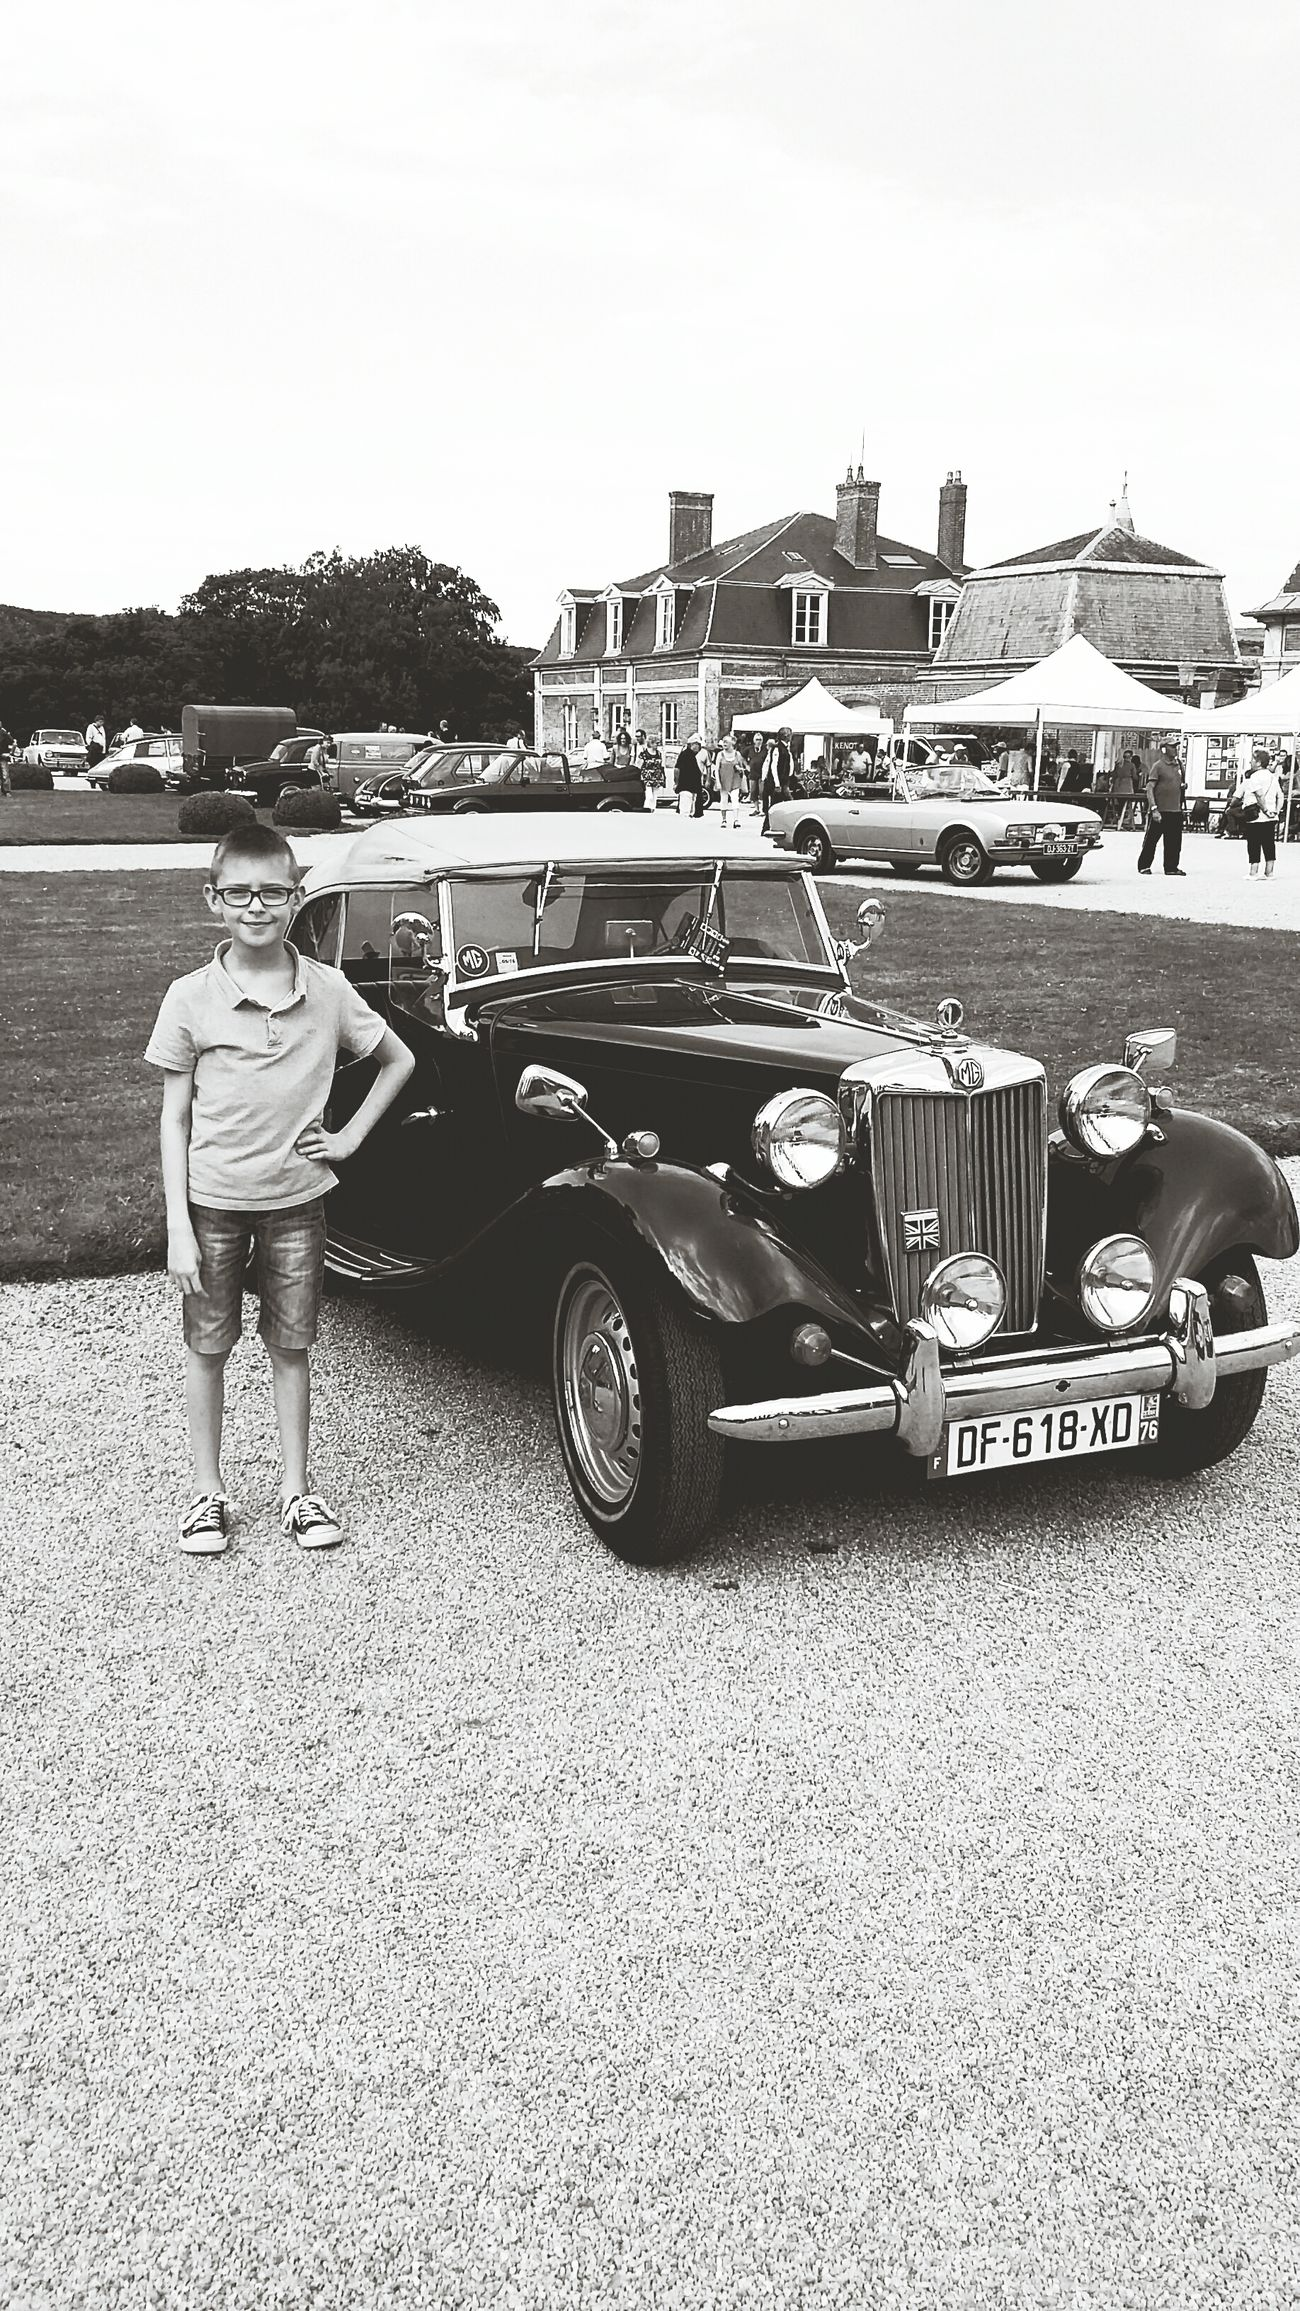 Mychild Blackandwhite Noir Et Blanc Noiretblanc Cars Car Voiture MyBoy Vieillevoiture Monfils